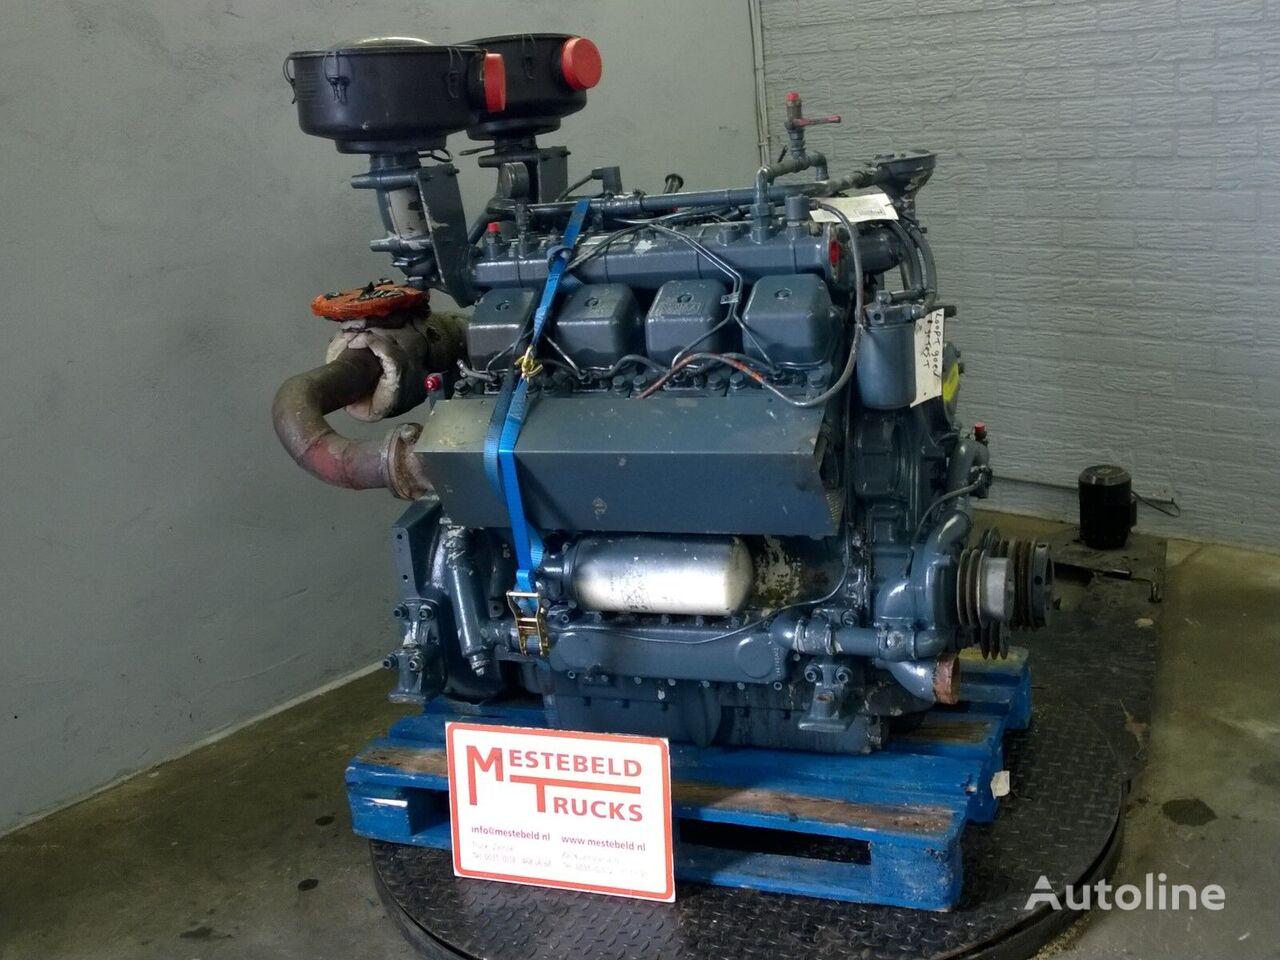 Motor MWM D234 V8 tır için MWM D234 V8 motor